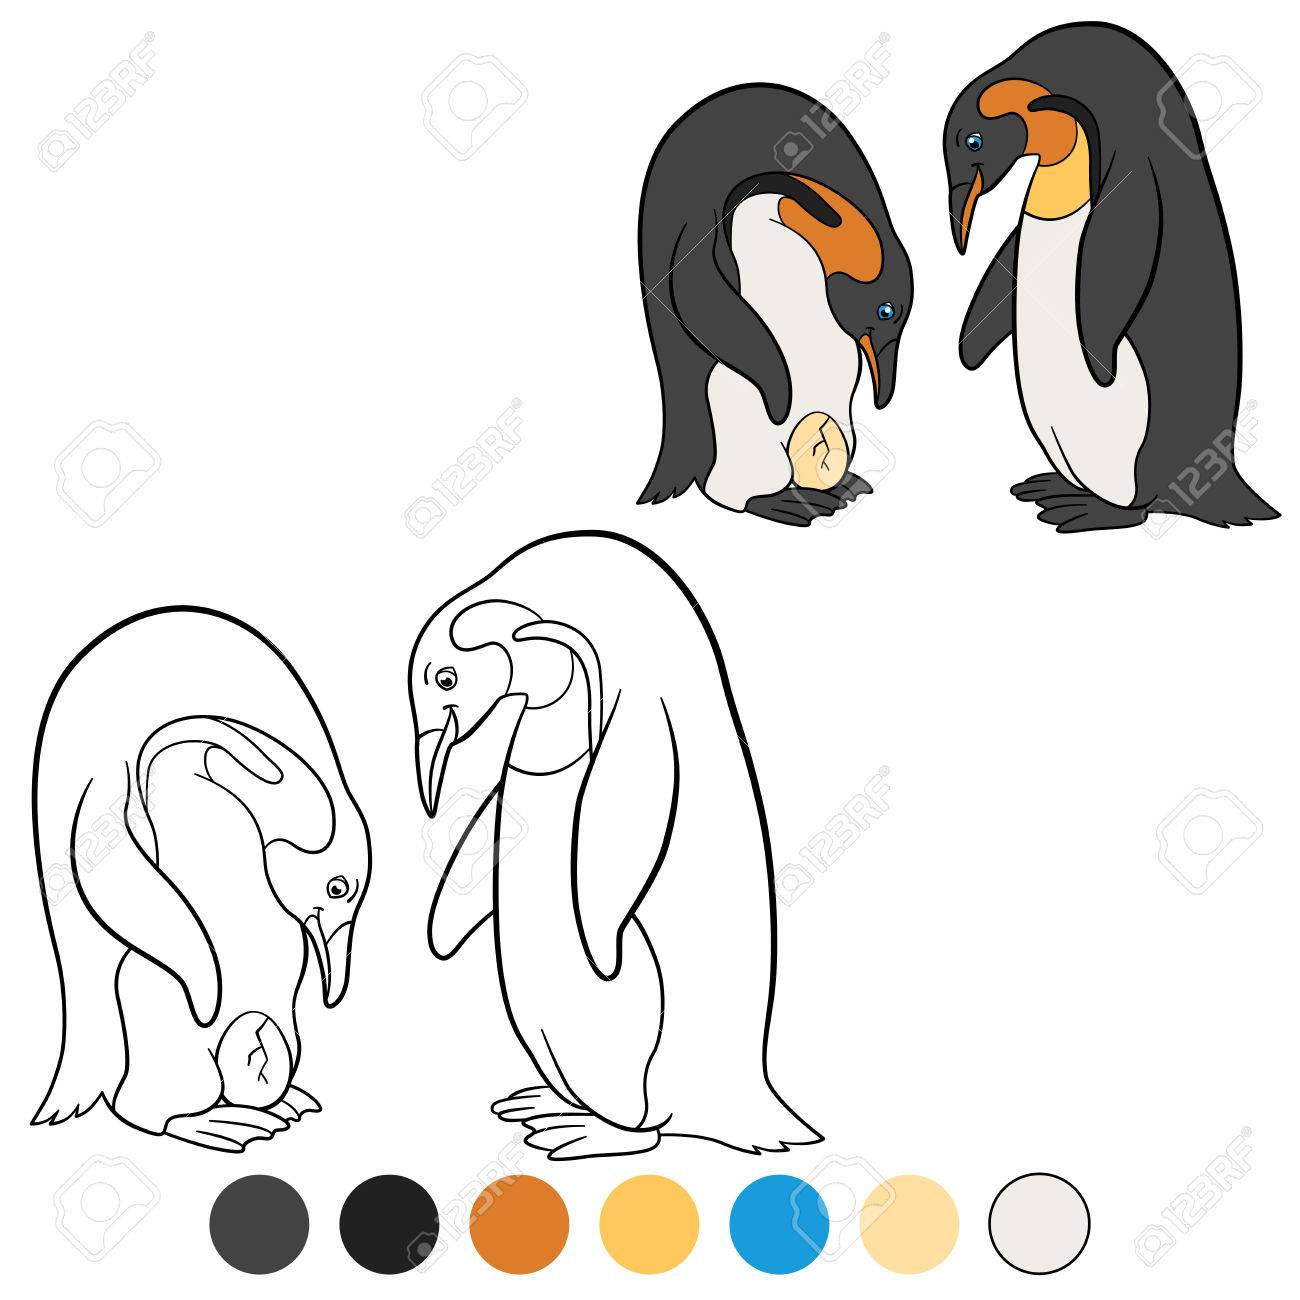 Único Libre Pinguino Para Colorear Imagen - Dibujos Para Colorear En ...